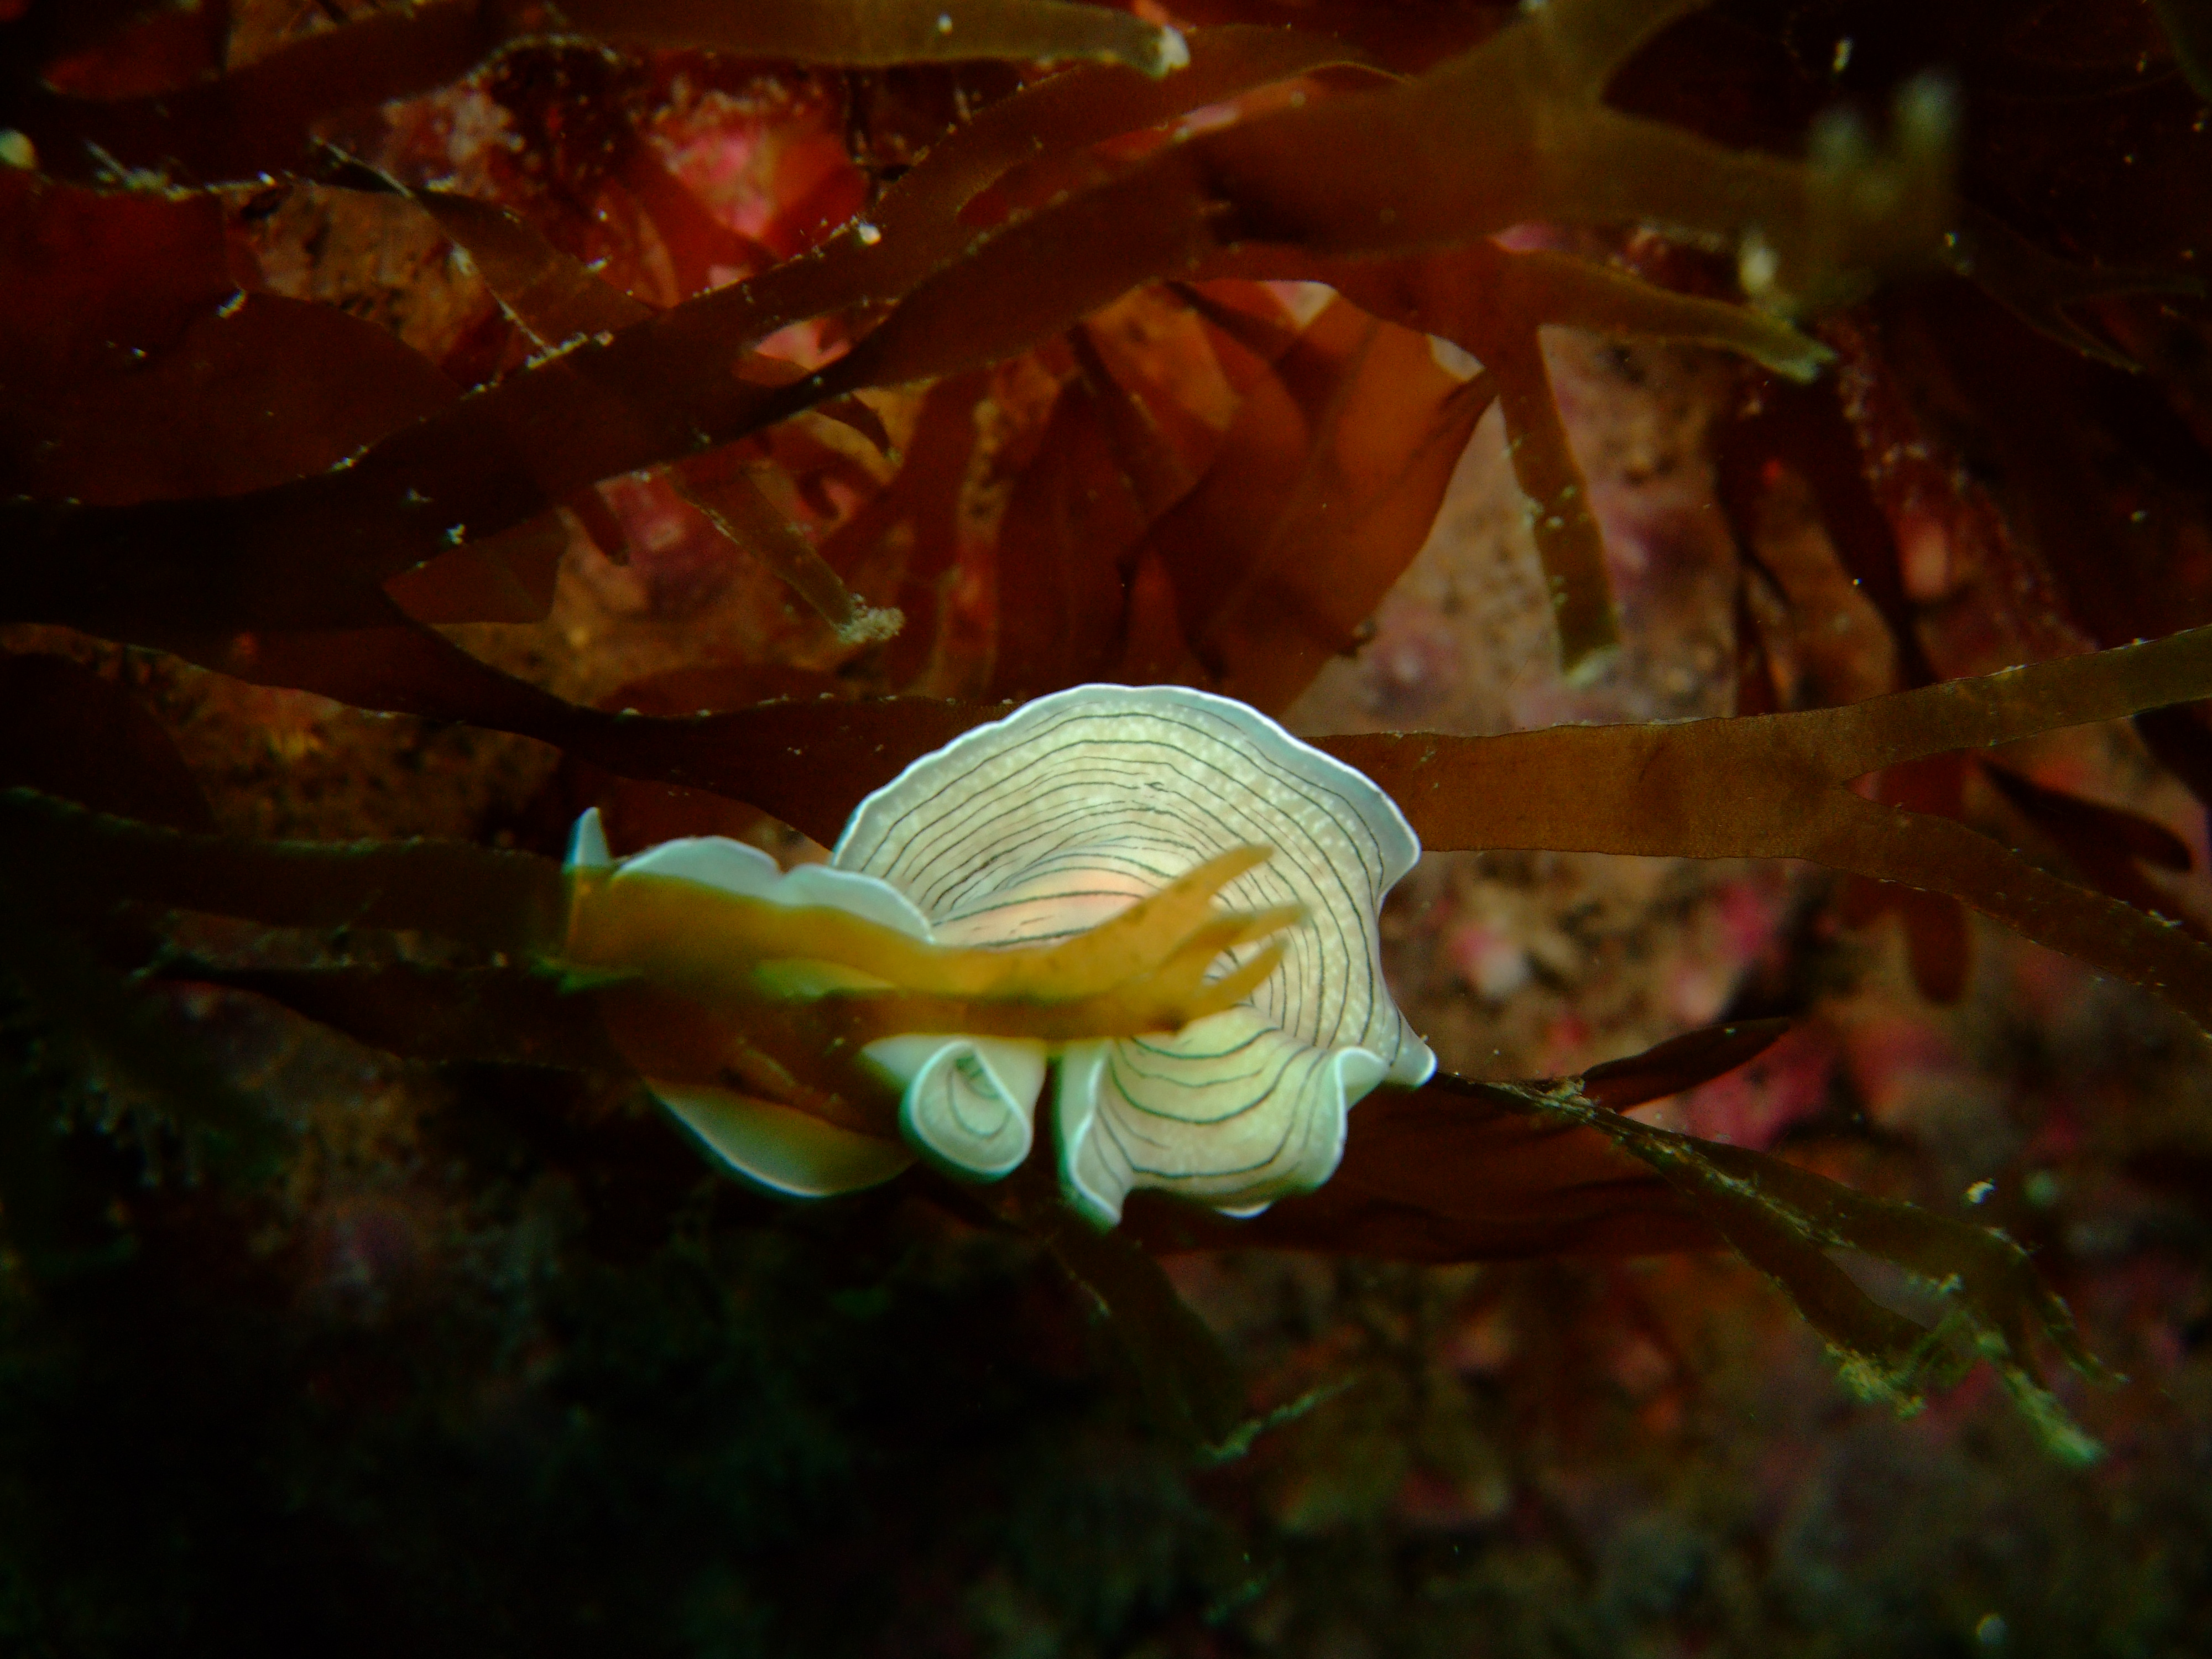 Candystripe flatworm2 (Prosthecereus vittatus)